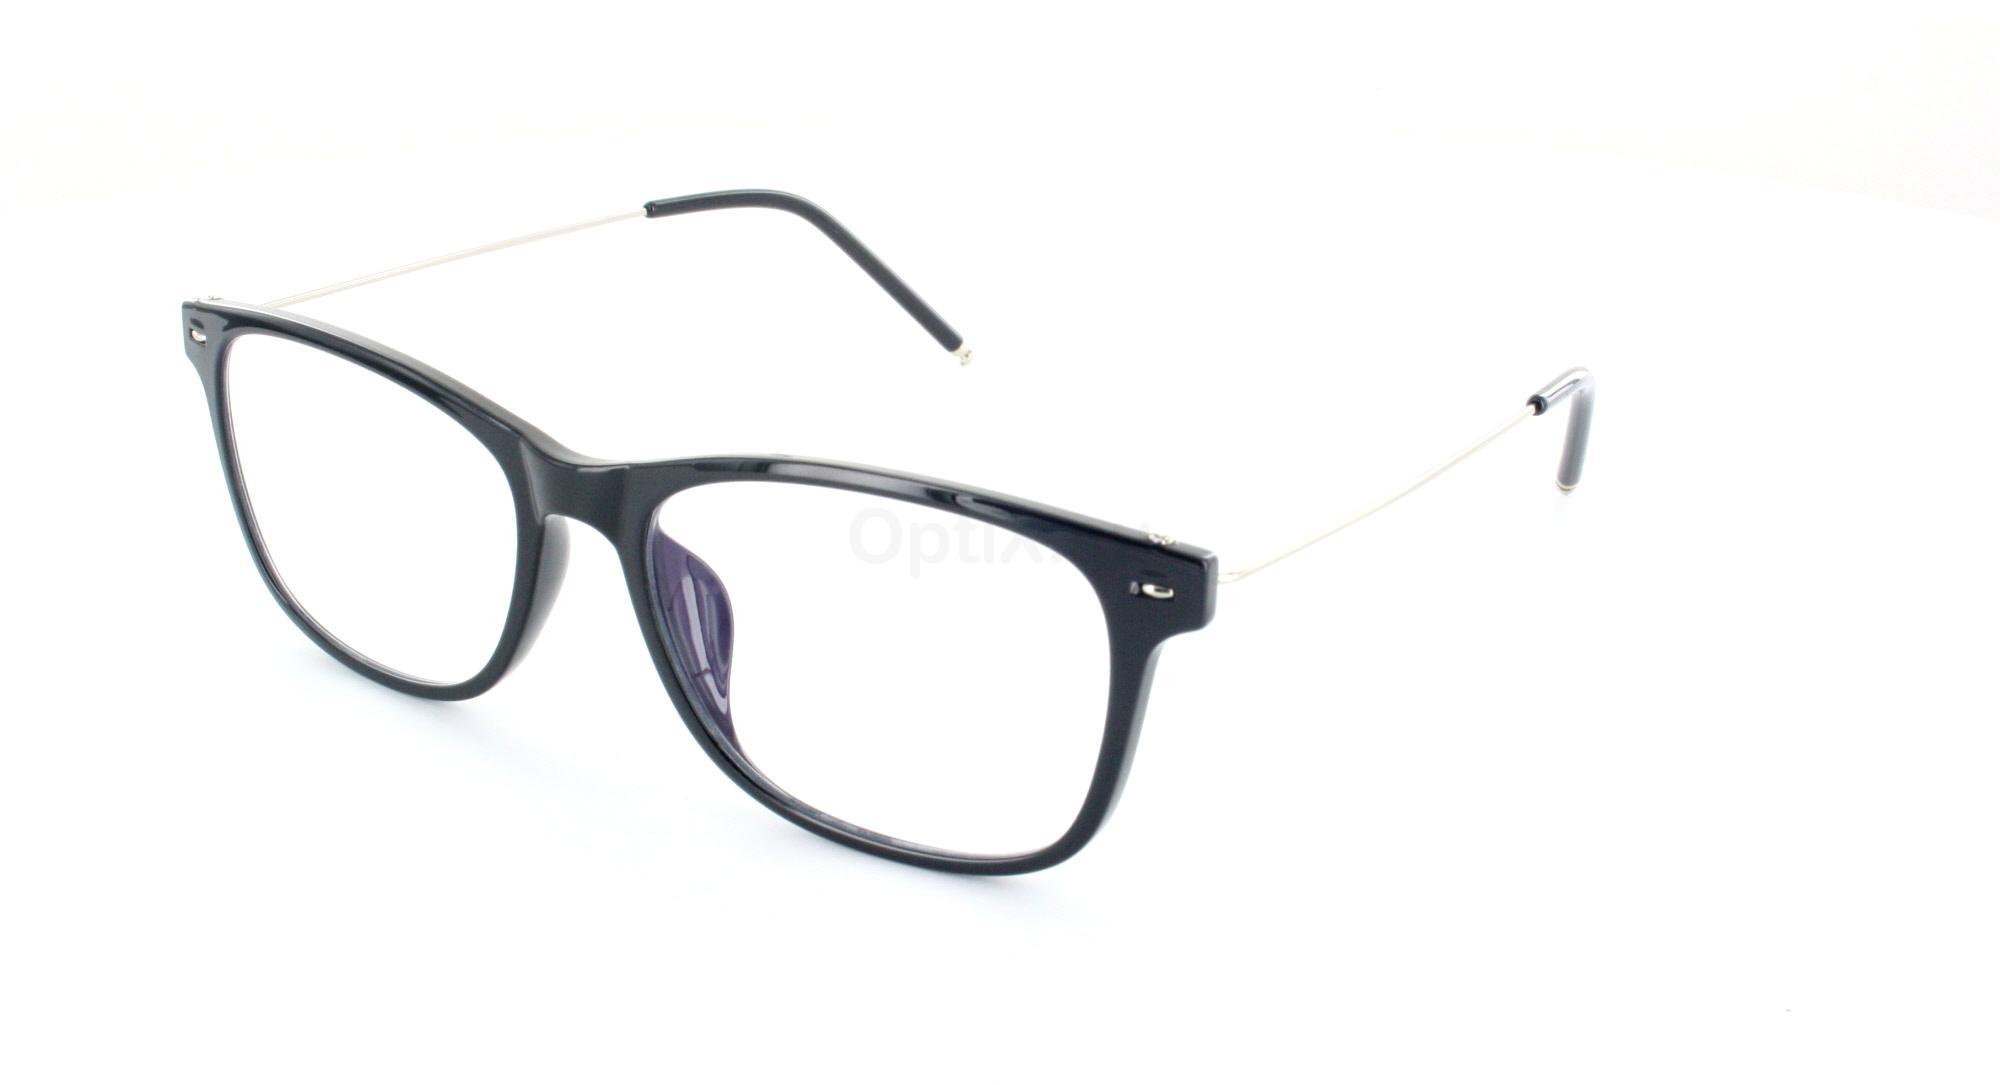 C01 6005 Glasses, Hallmark